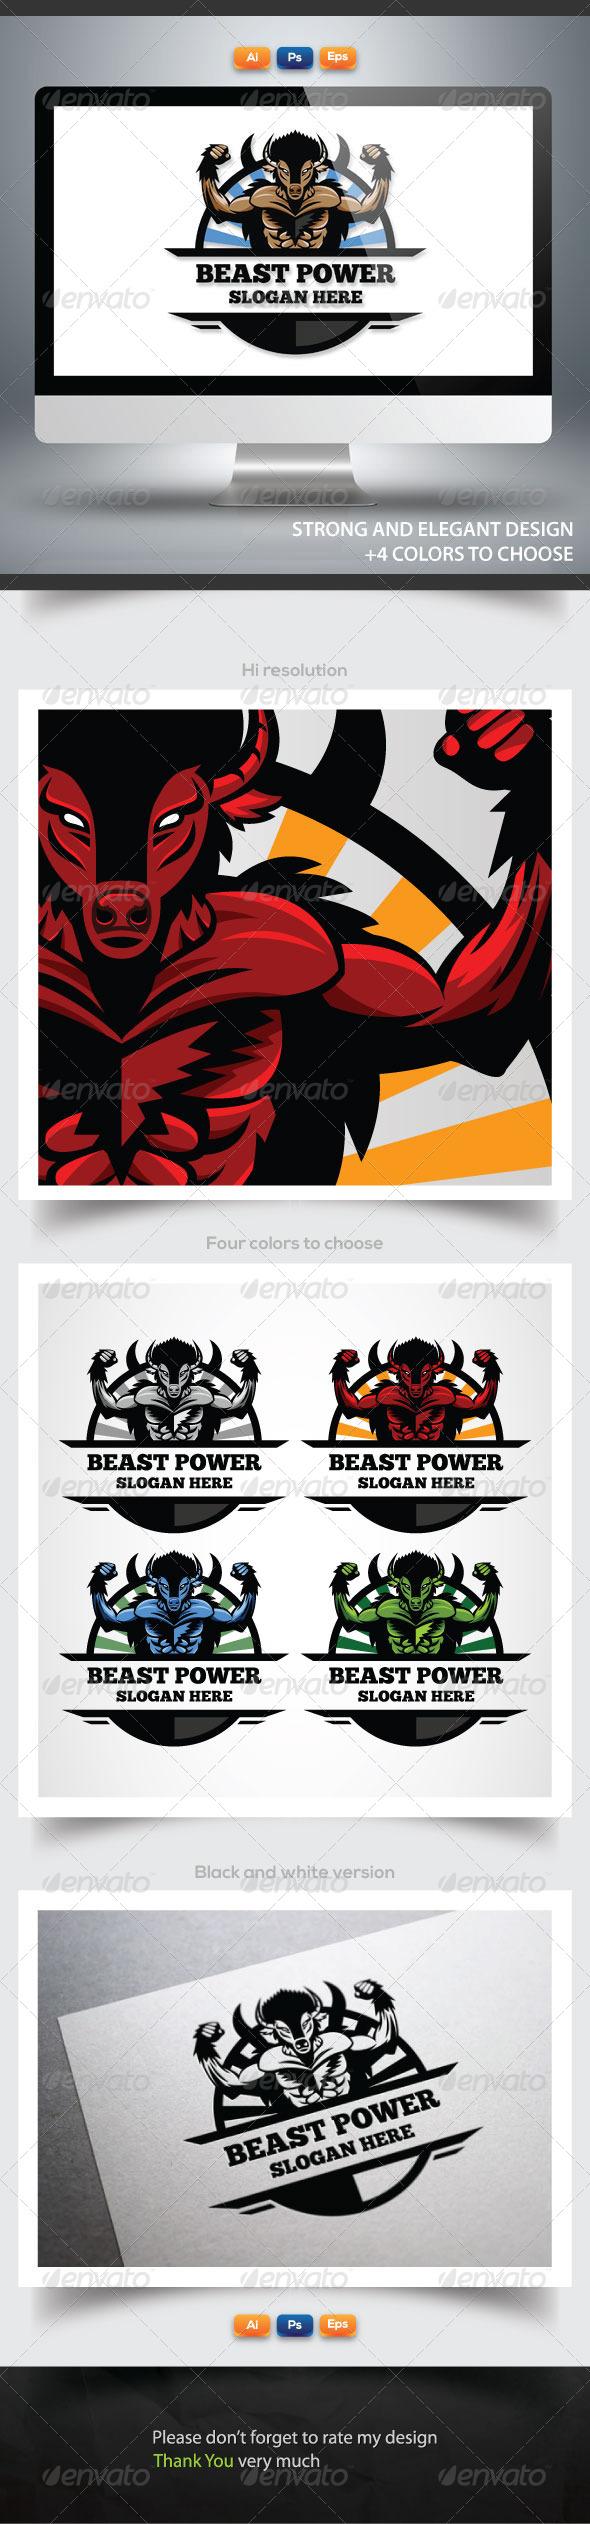 Beast Power